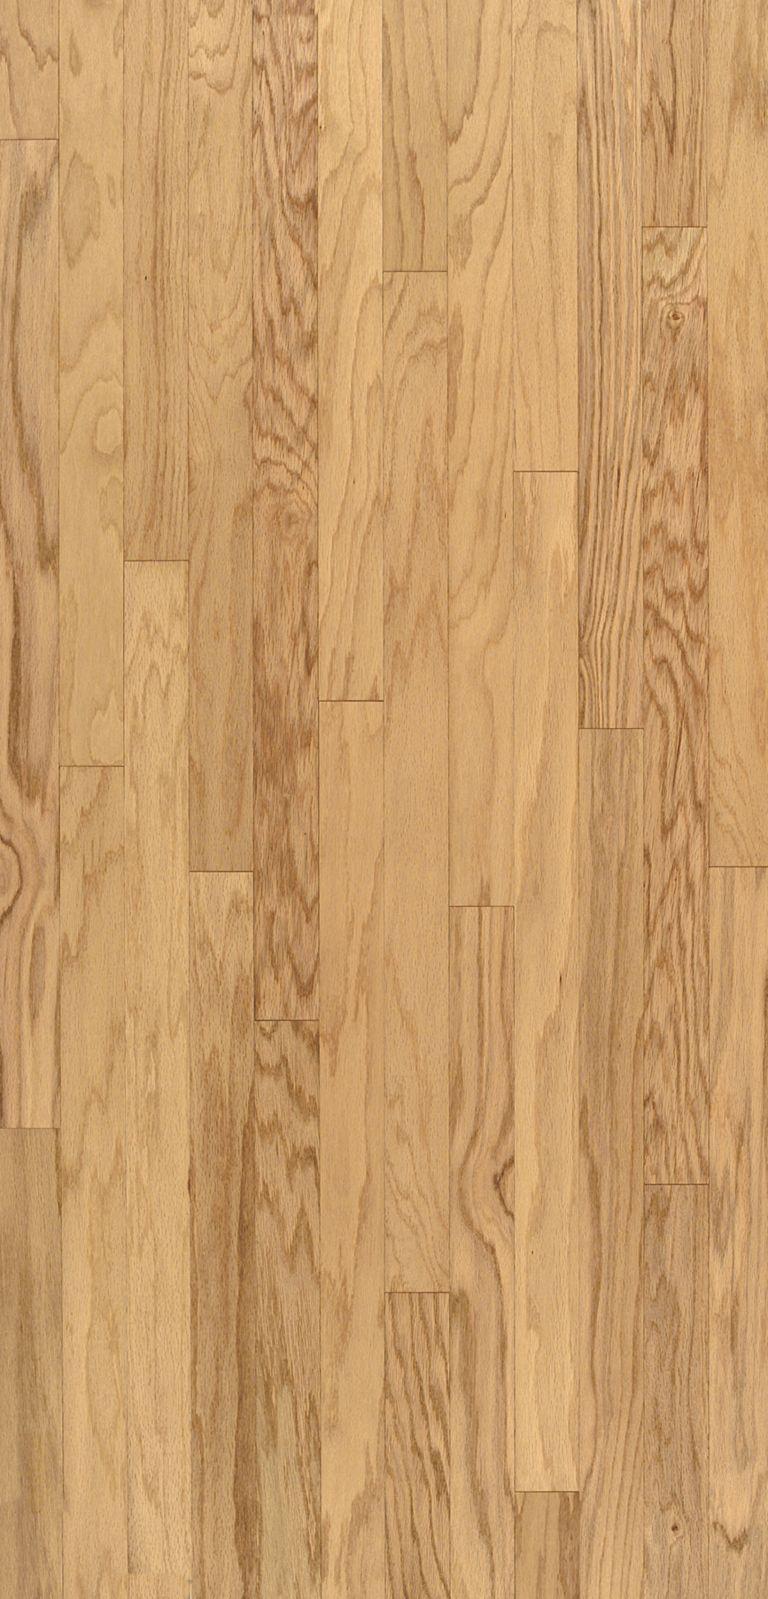 Oak - Natural Hardwood EAK20LG